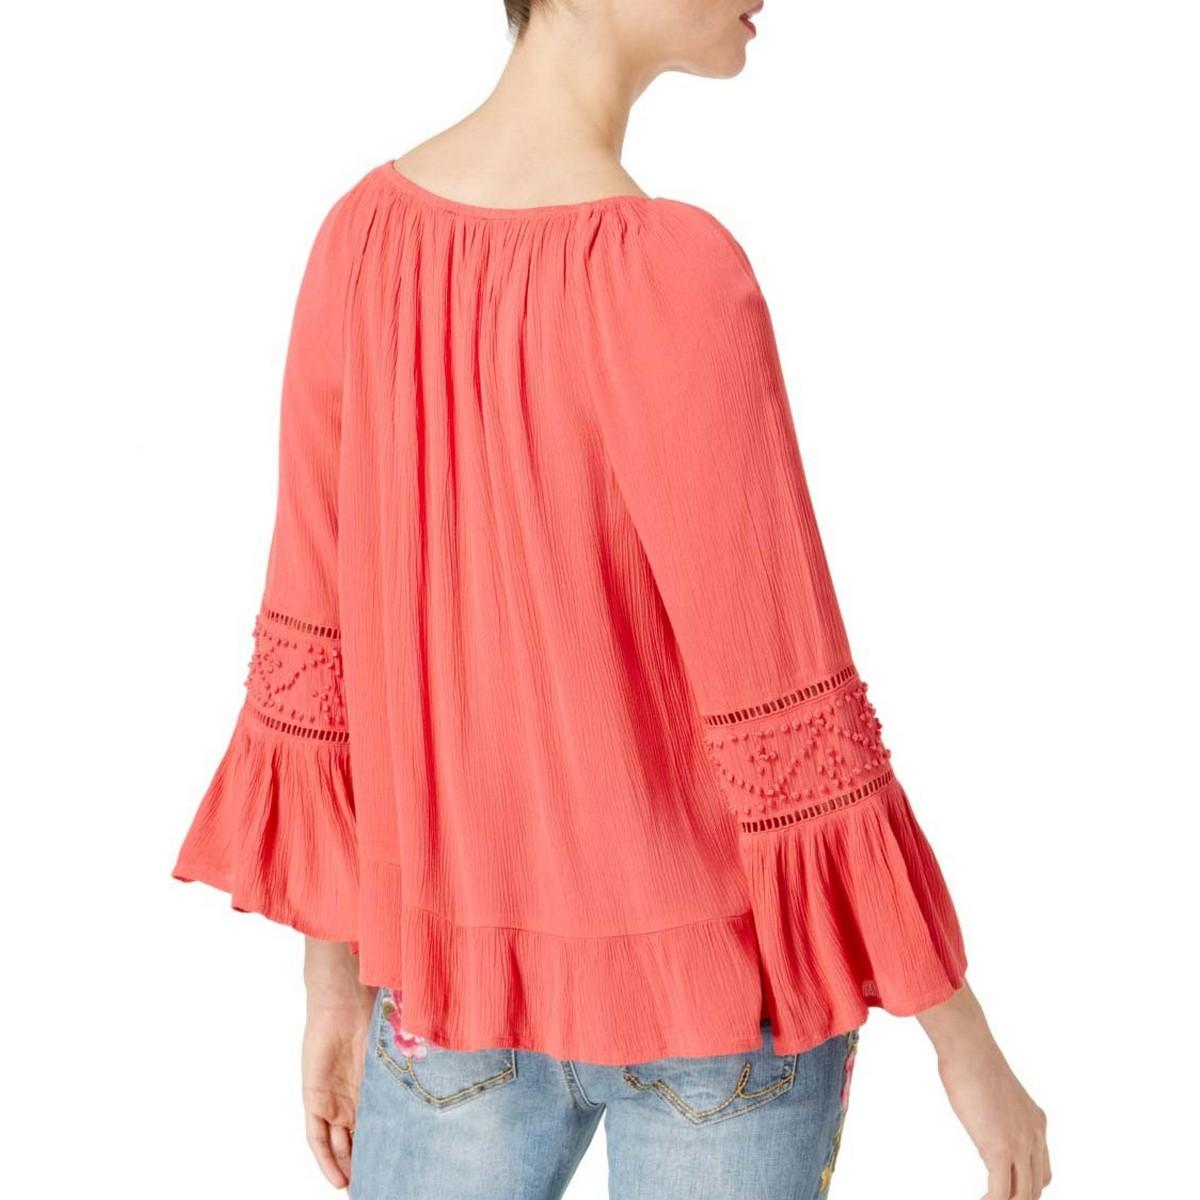 INC-NEW-Women-039-s-Bell-sleeve-Peasant-Crinkled-Blouse-Shirt-Top-TEDO thumbnail 5